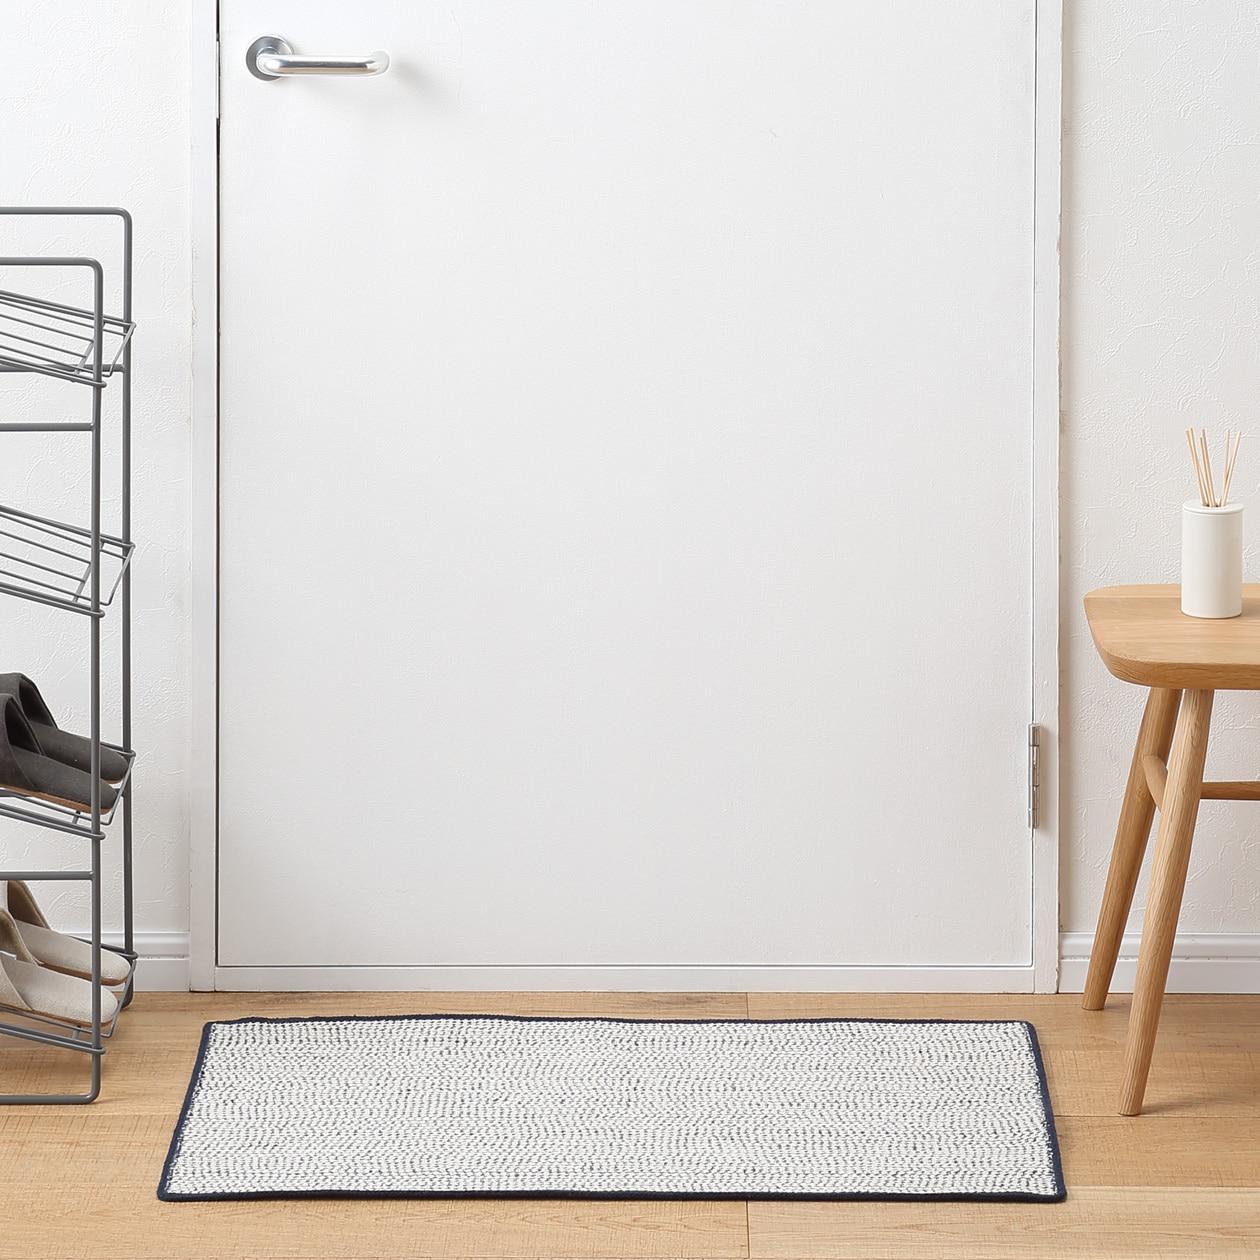 RoomClip商品情報 - インド綿組紐マット/ネイビーメランジ